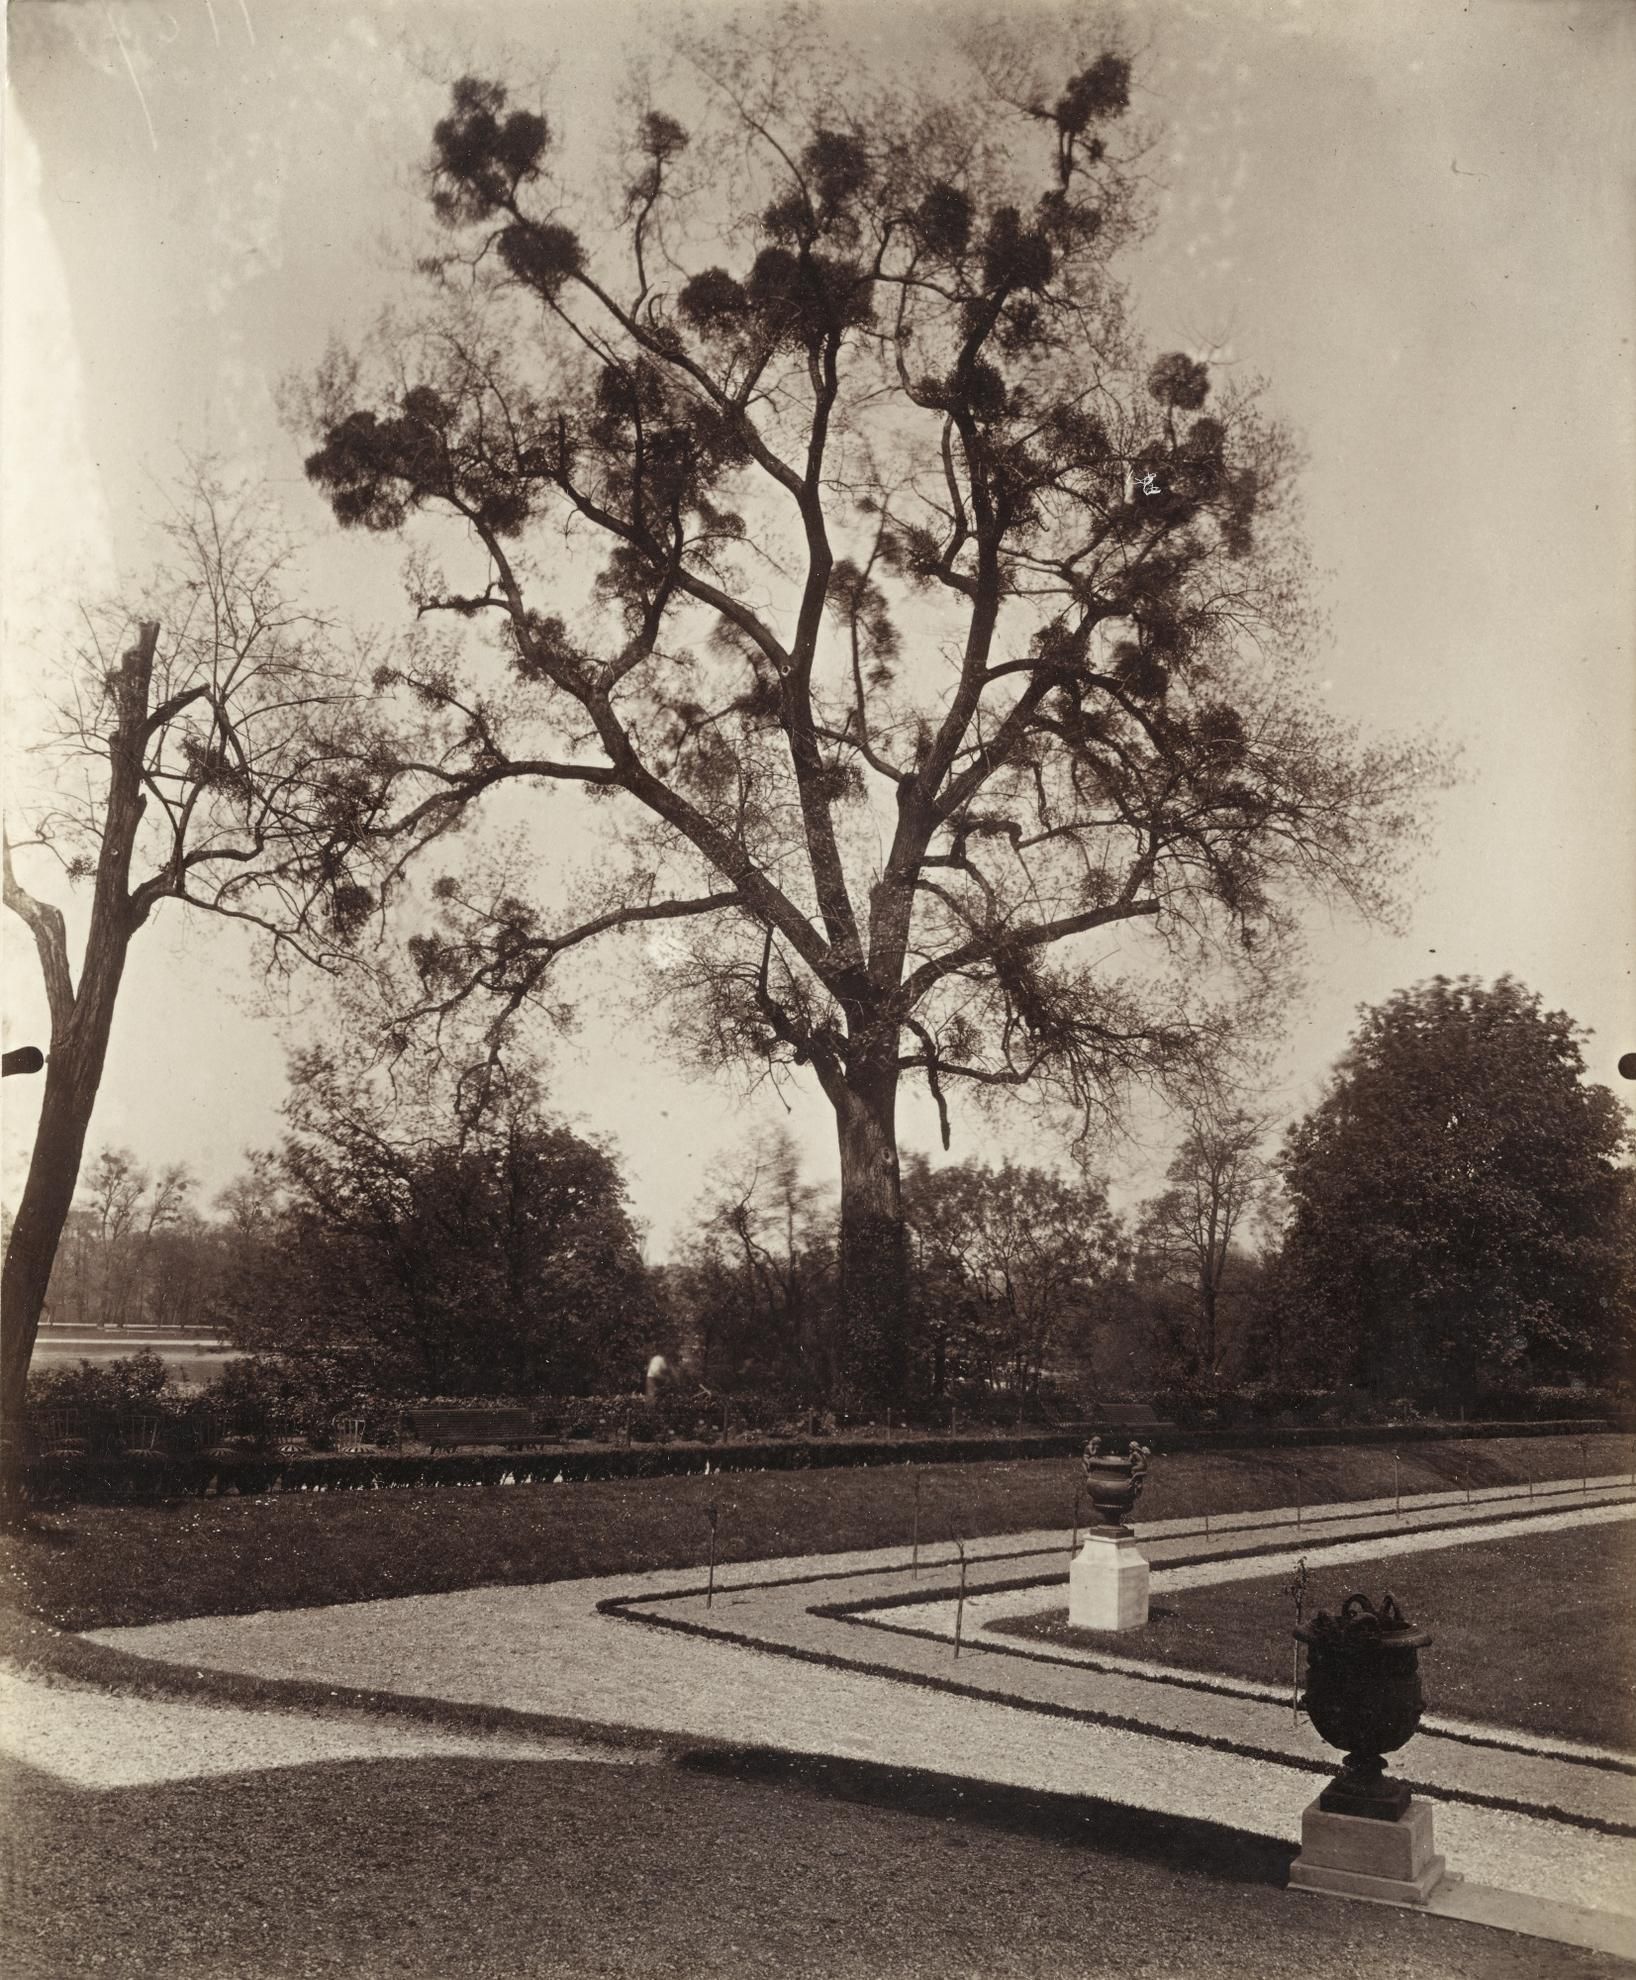 Eugene Atget-Arbre Avec Gui Mistletoe-1921